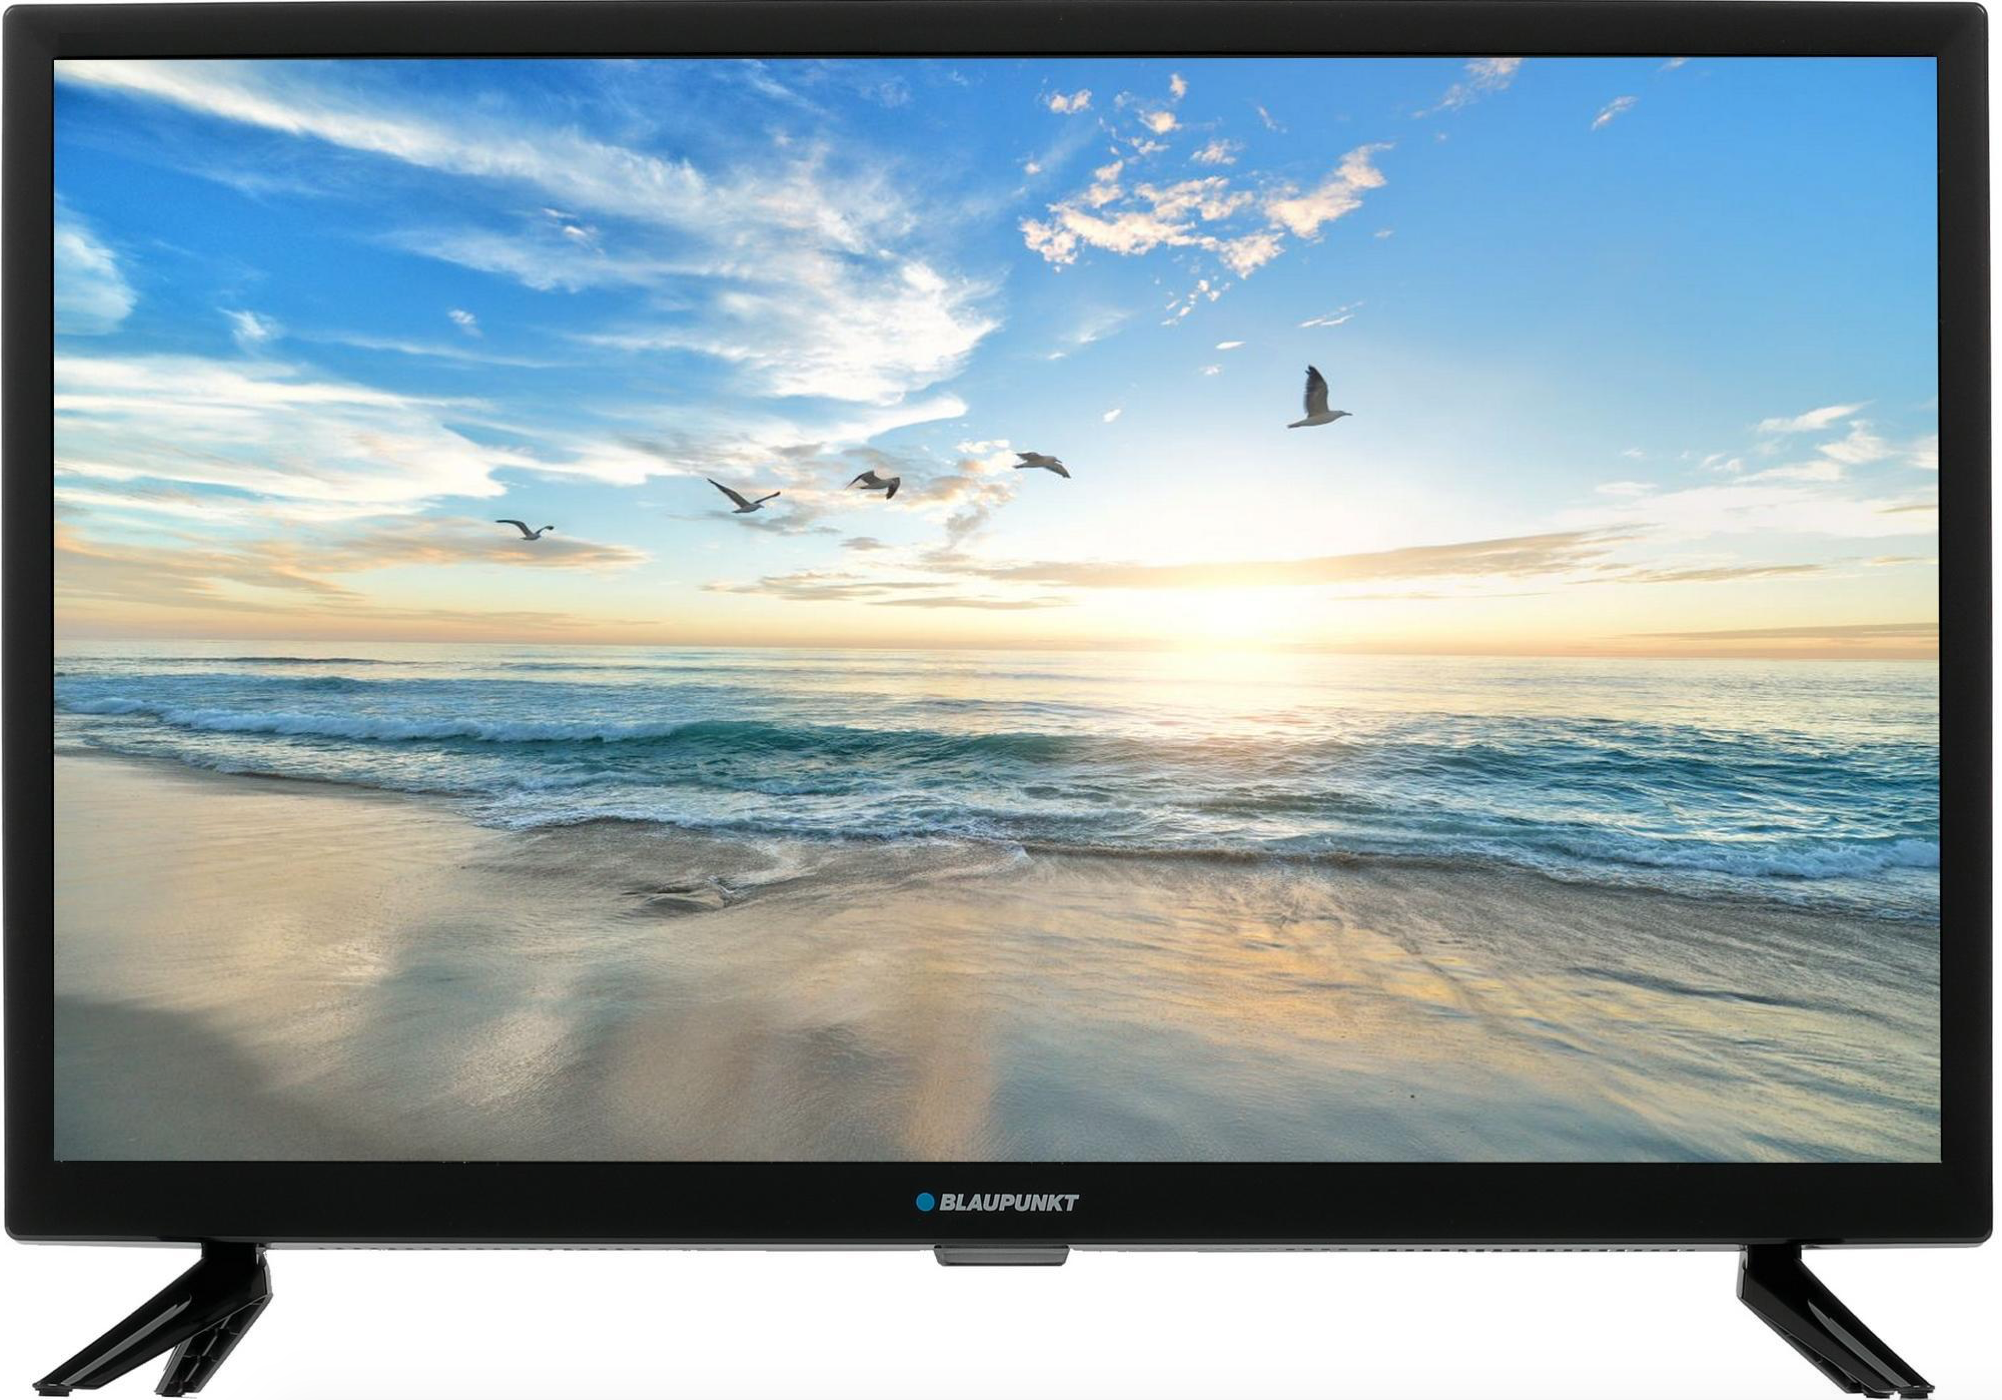 Телевизор Blaupunkt 24WB865T Black